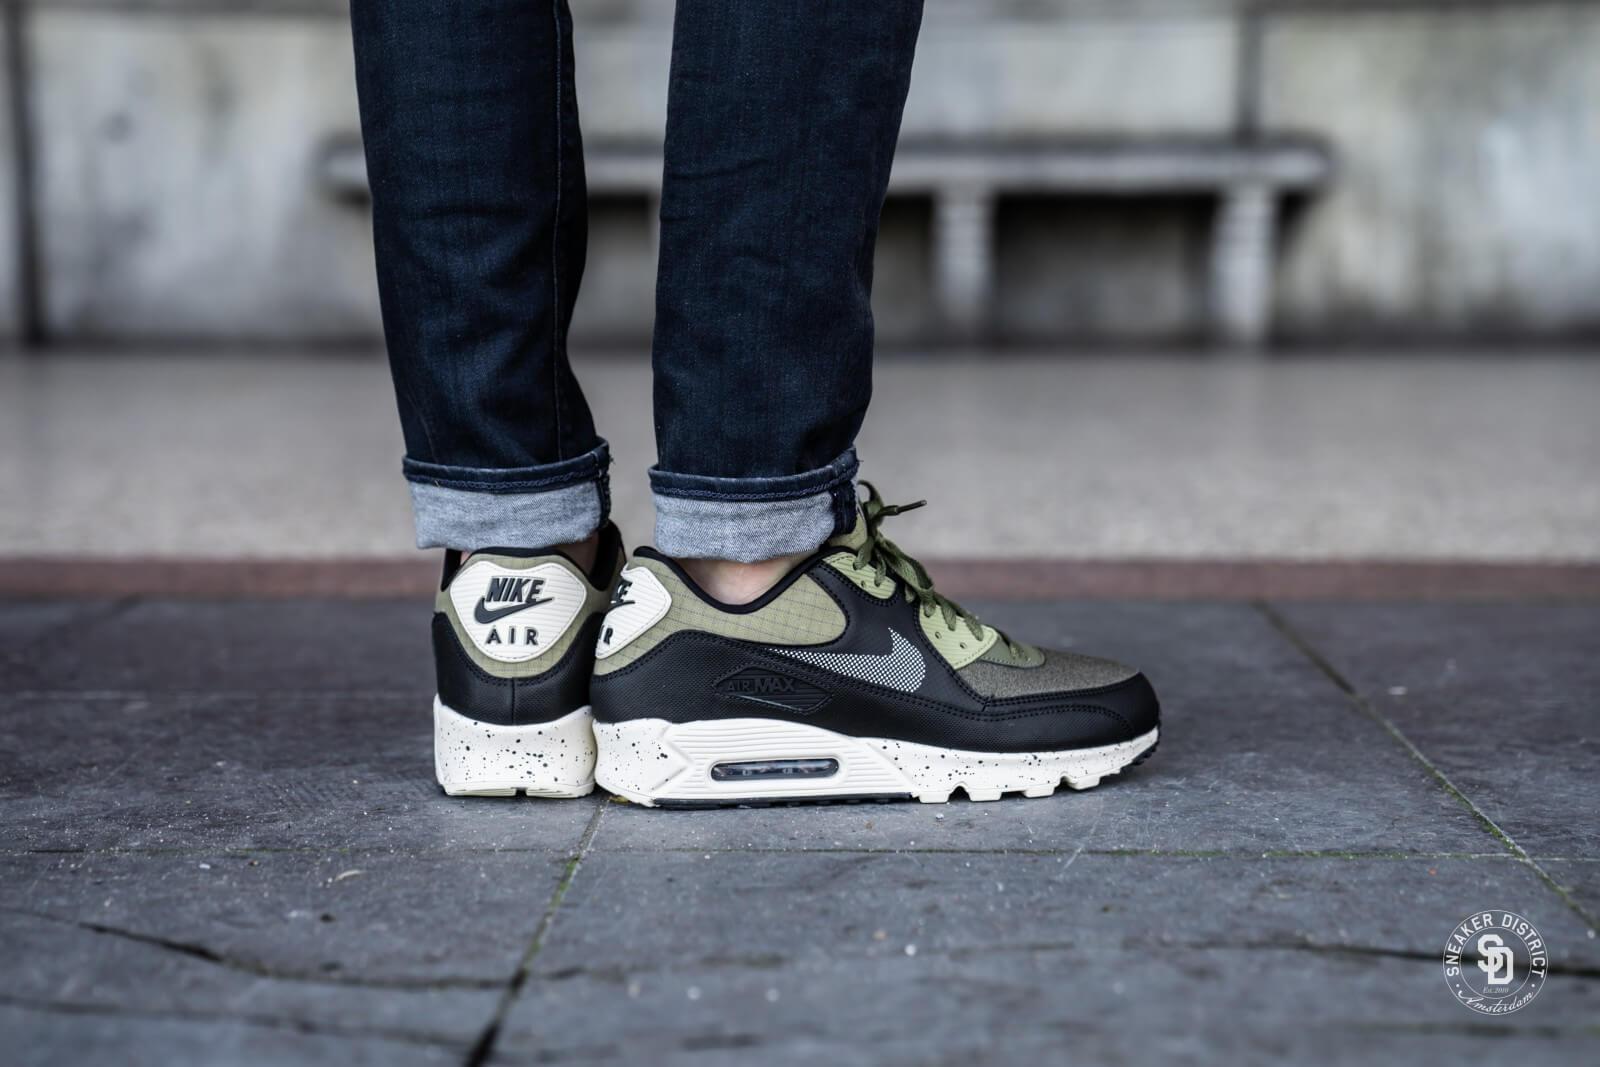 Nike Air Max 90 Premium Neutral Olive/Black